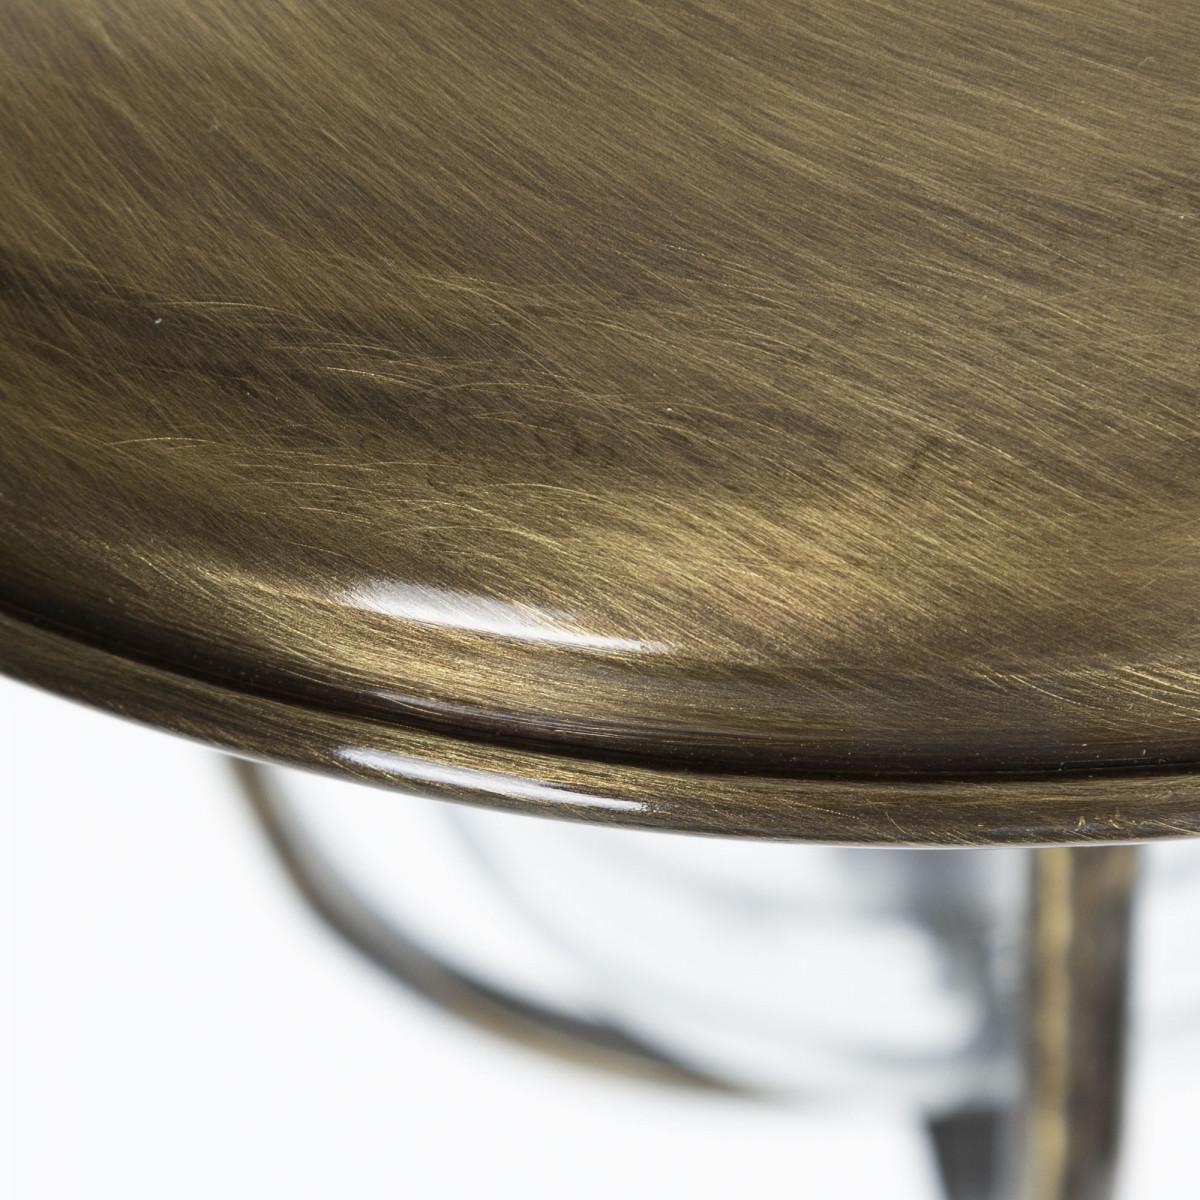 Monte (7710) - KS Verlichting - Buitenverlichting wandlamp brons